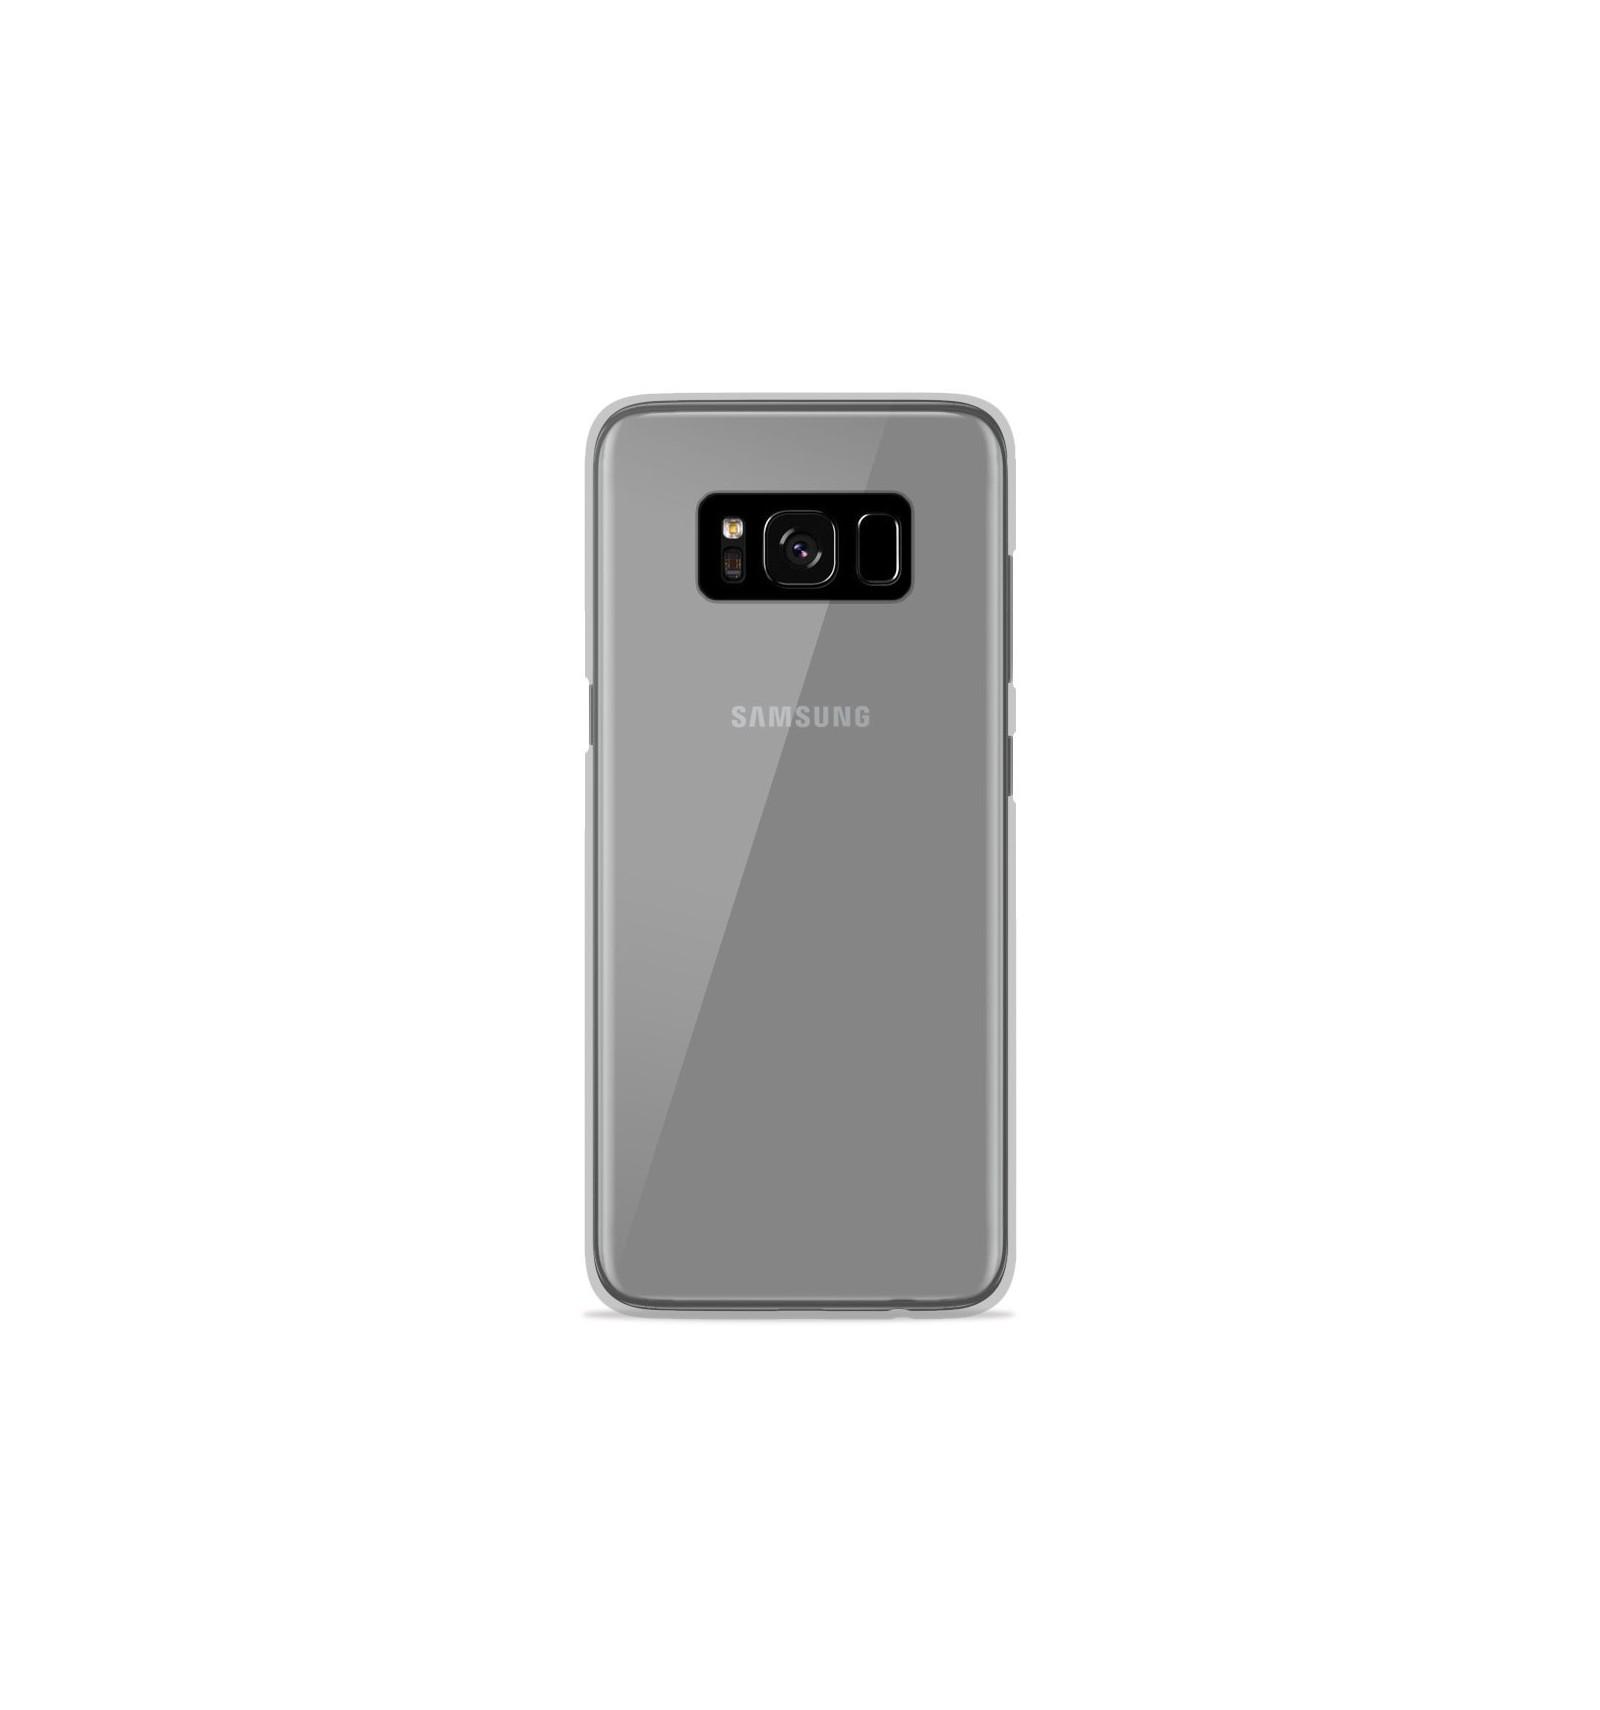 Coque Samsung Galaxy S8 Silicone Gel givré - Transparent